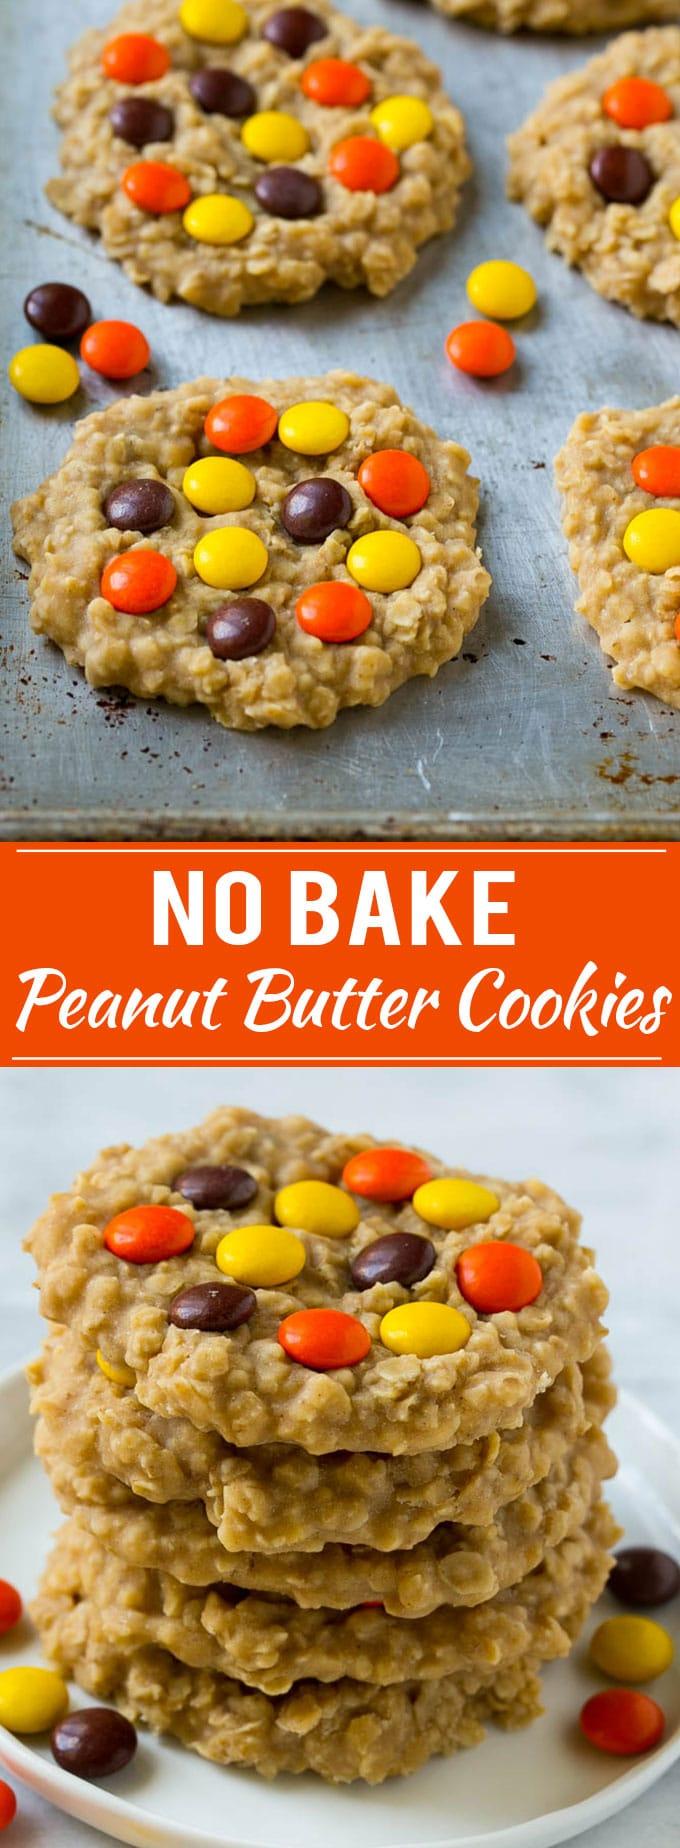 No Bake Peanut Butter Cookies Recipe | No Bake Cookies | Peanut Butter Cookies